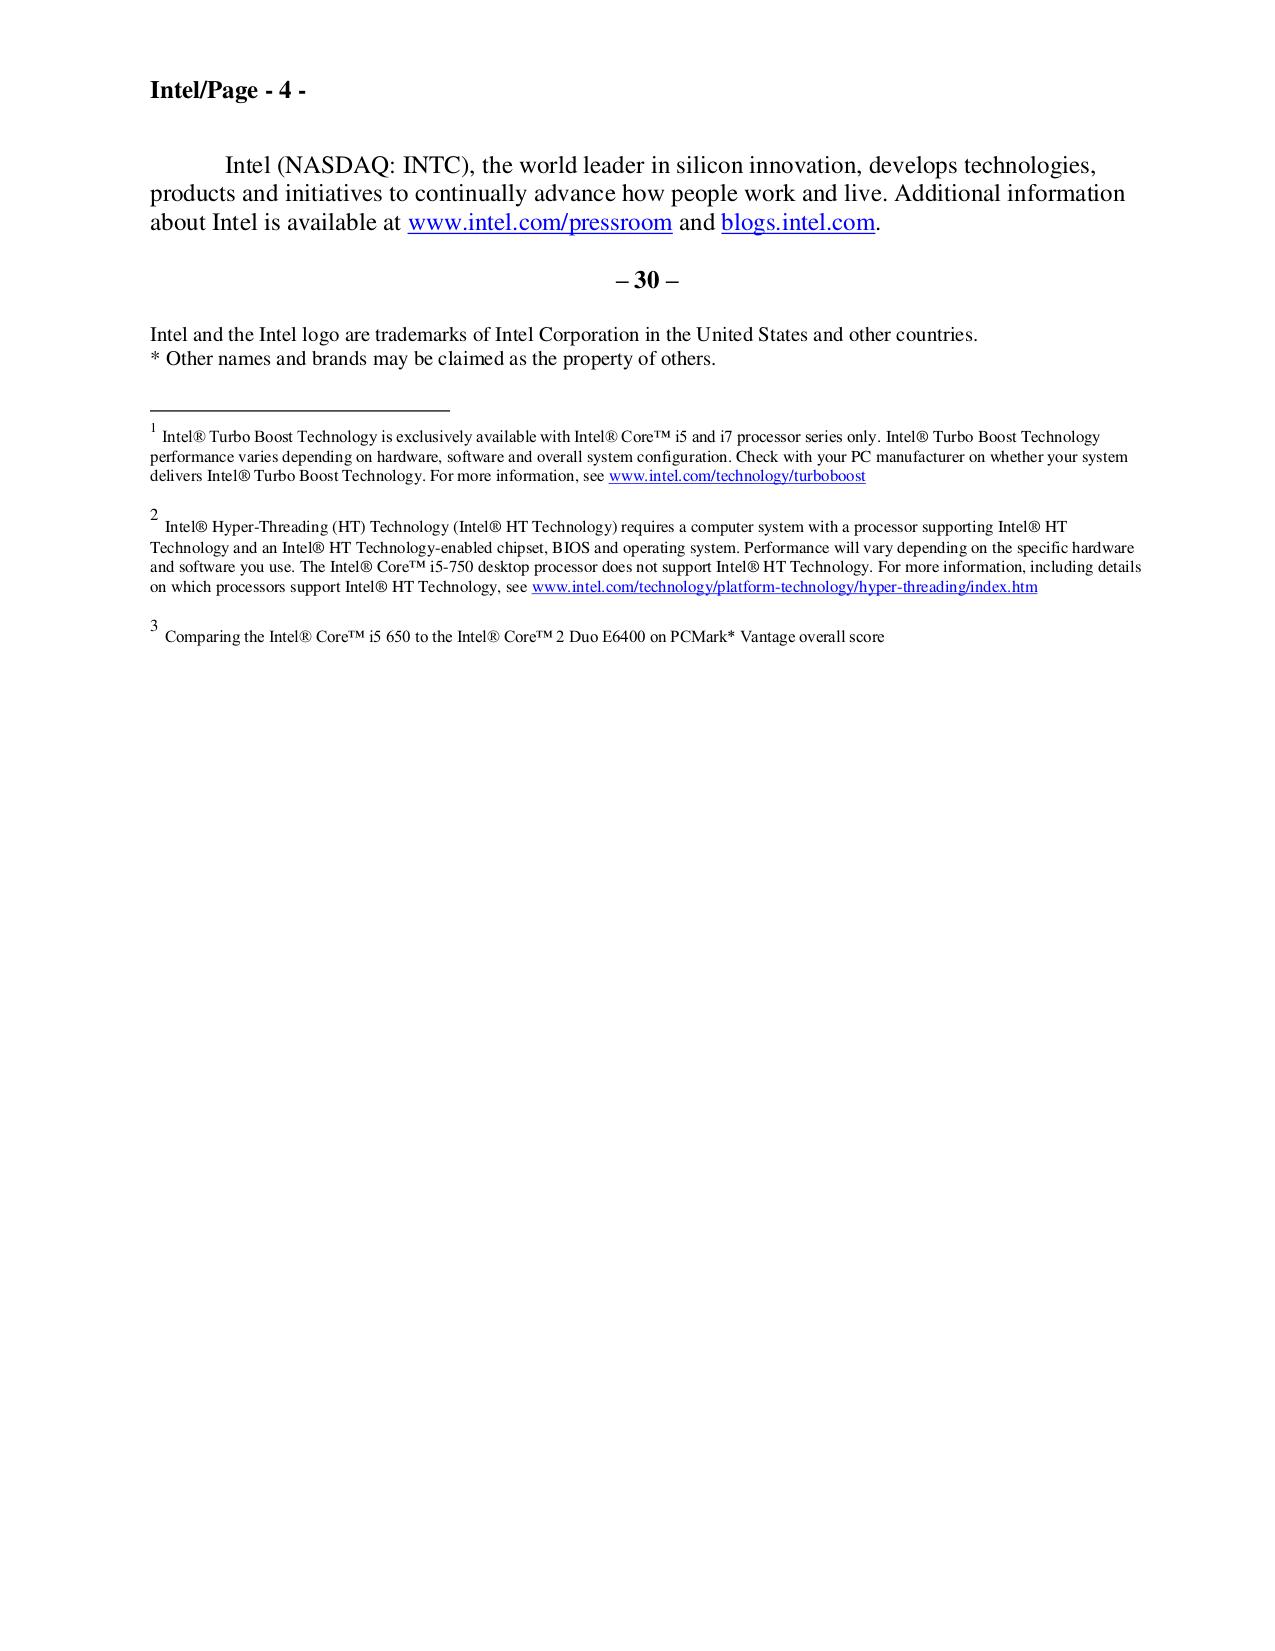 Viliv Laptop S7 pdf page preview